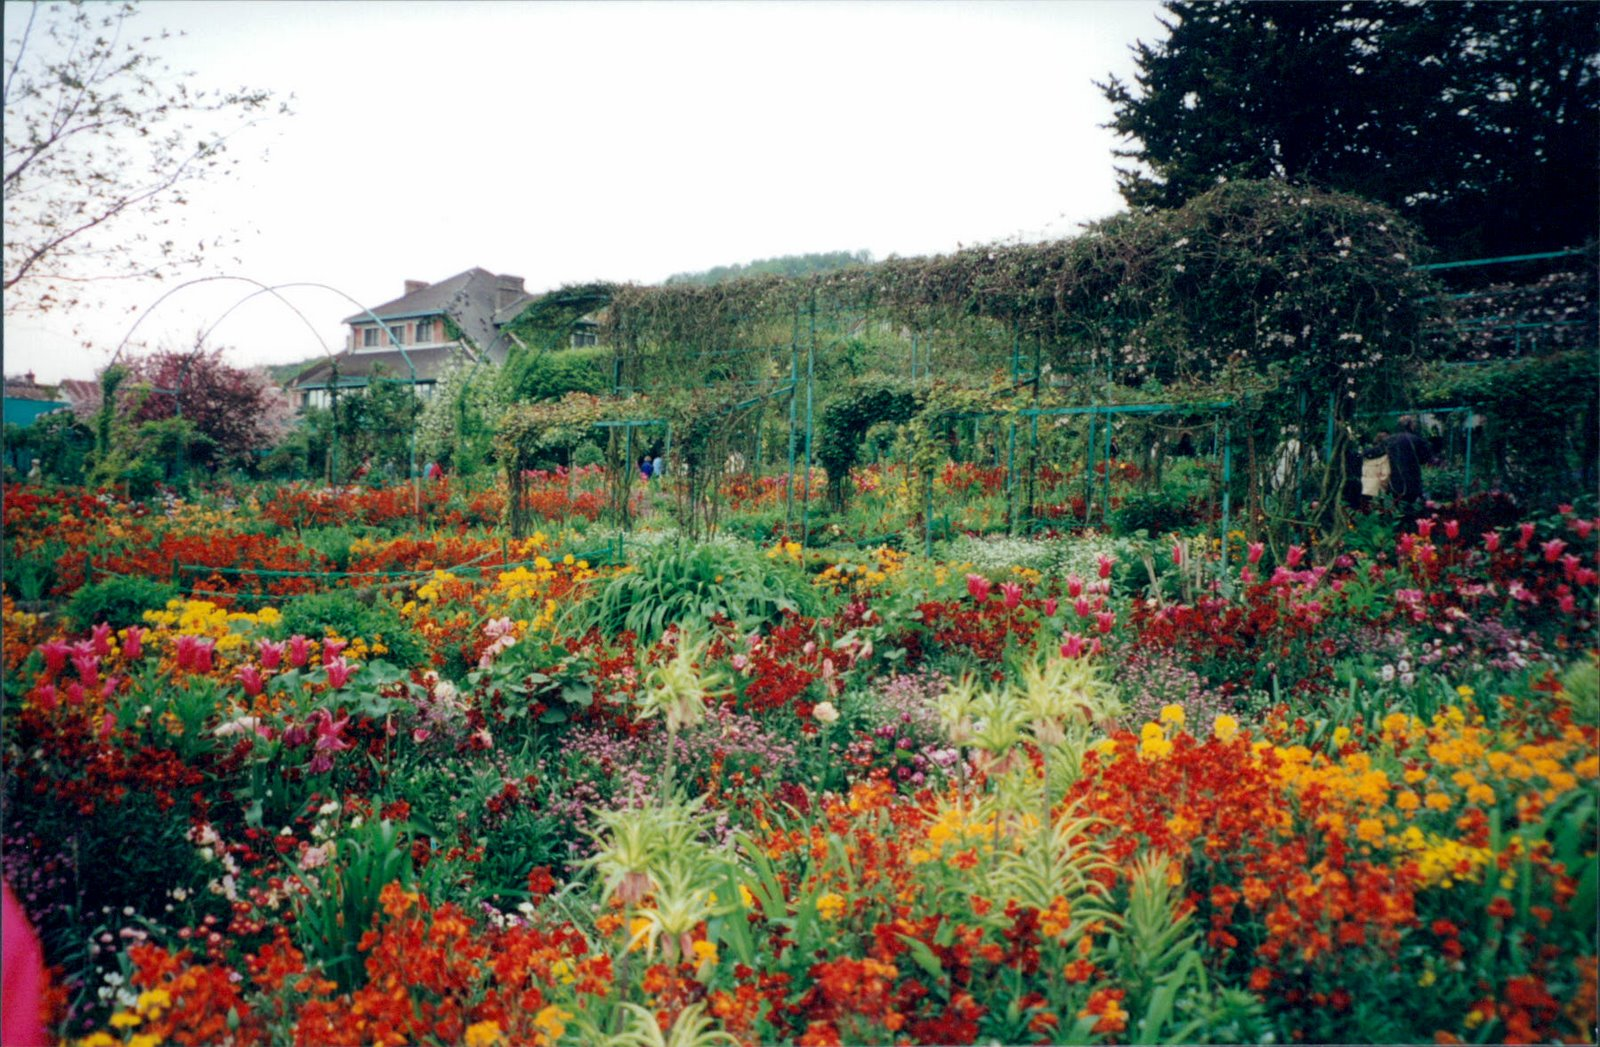 View of Monet's gardens